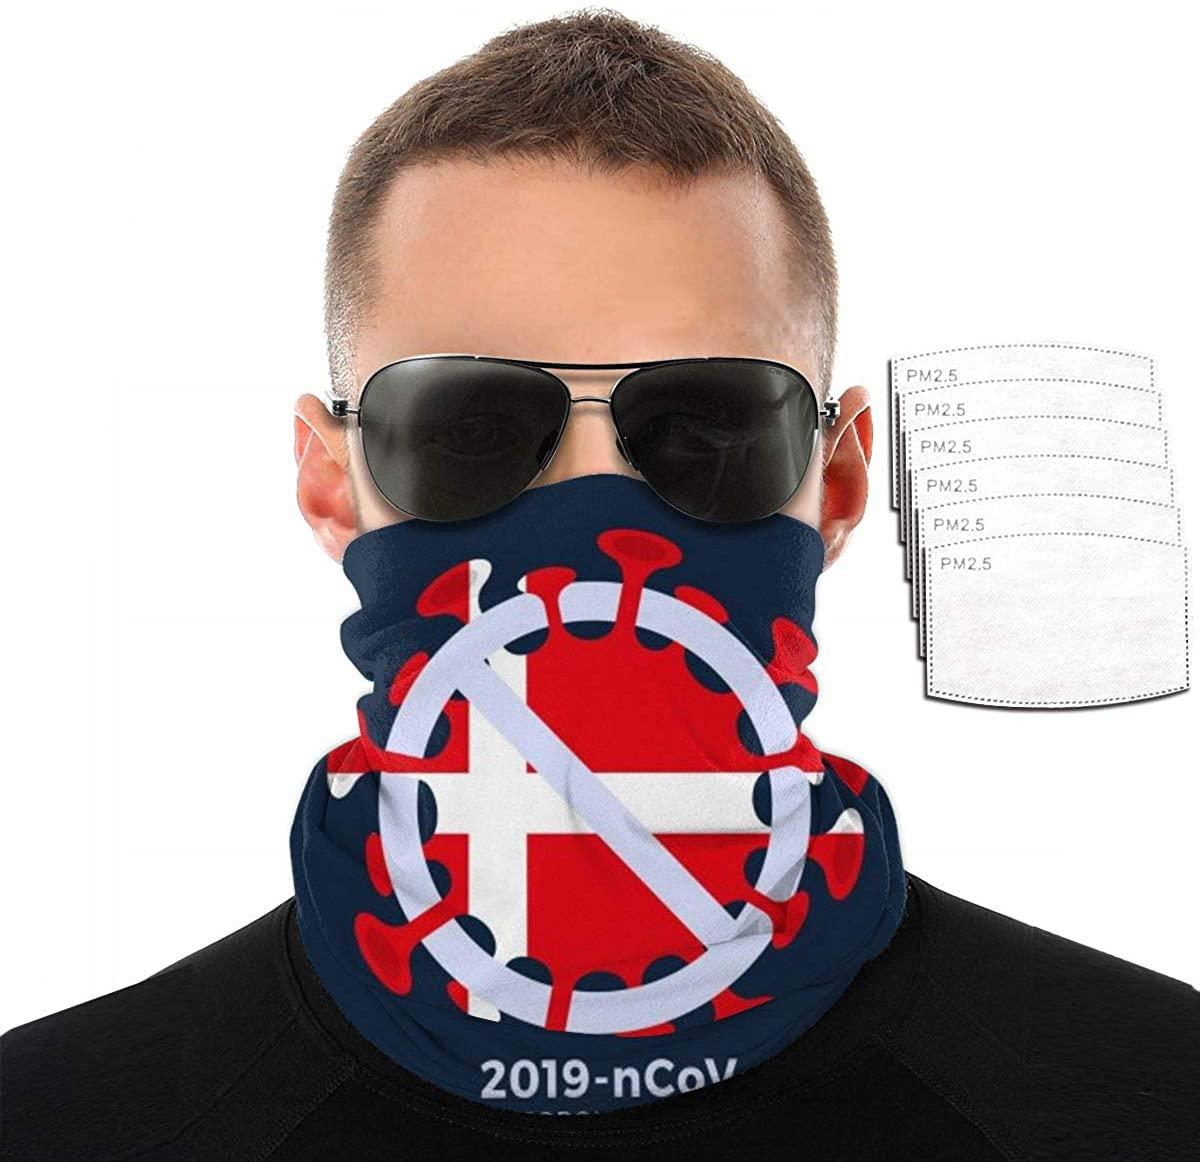 Bandana Neck Gaiter With Filter Illustration Denmark Flag Caution Coronav-irus Uv Mask Breathable Sport&Outdoor For Sport&Outdoor Summer